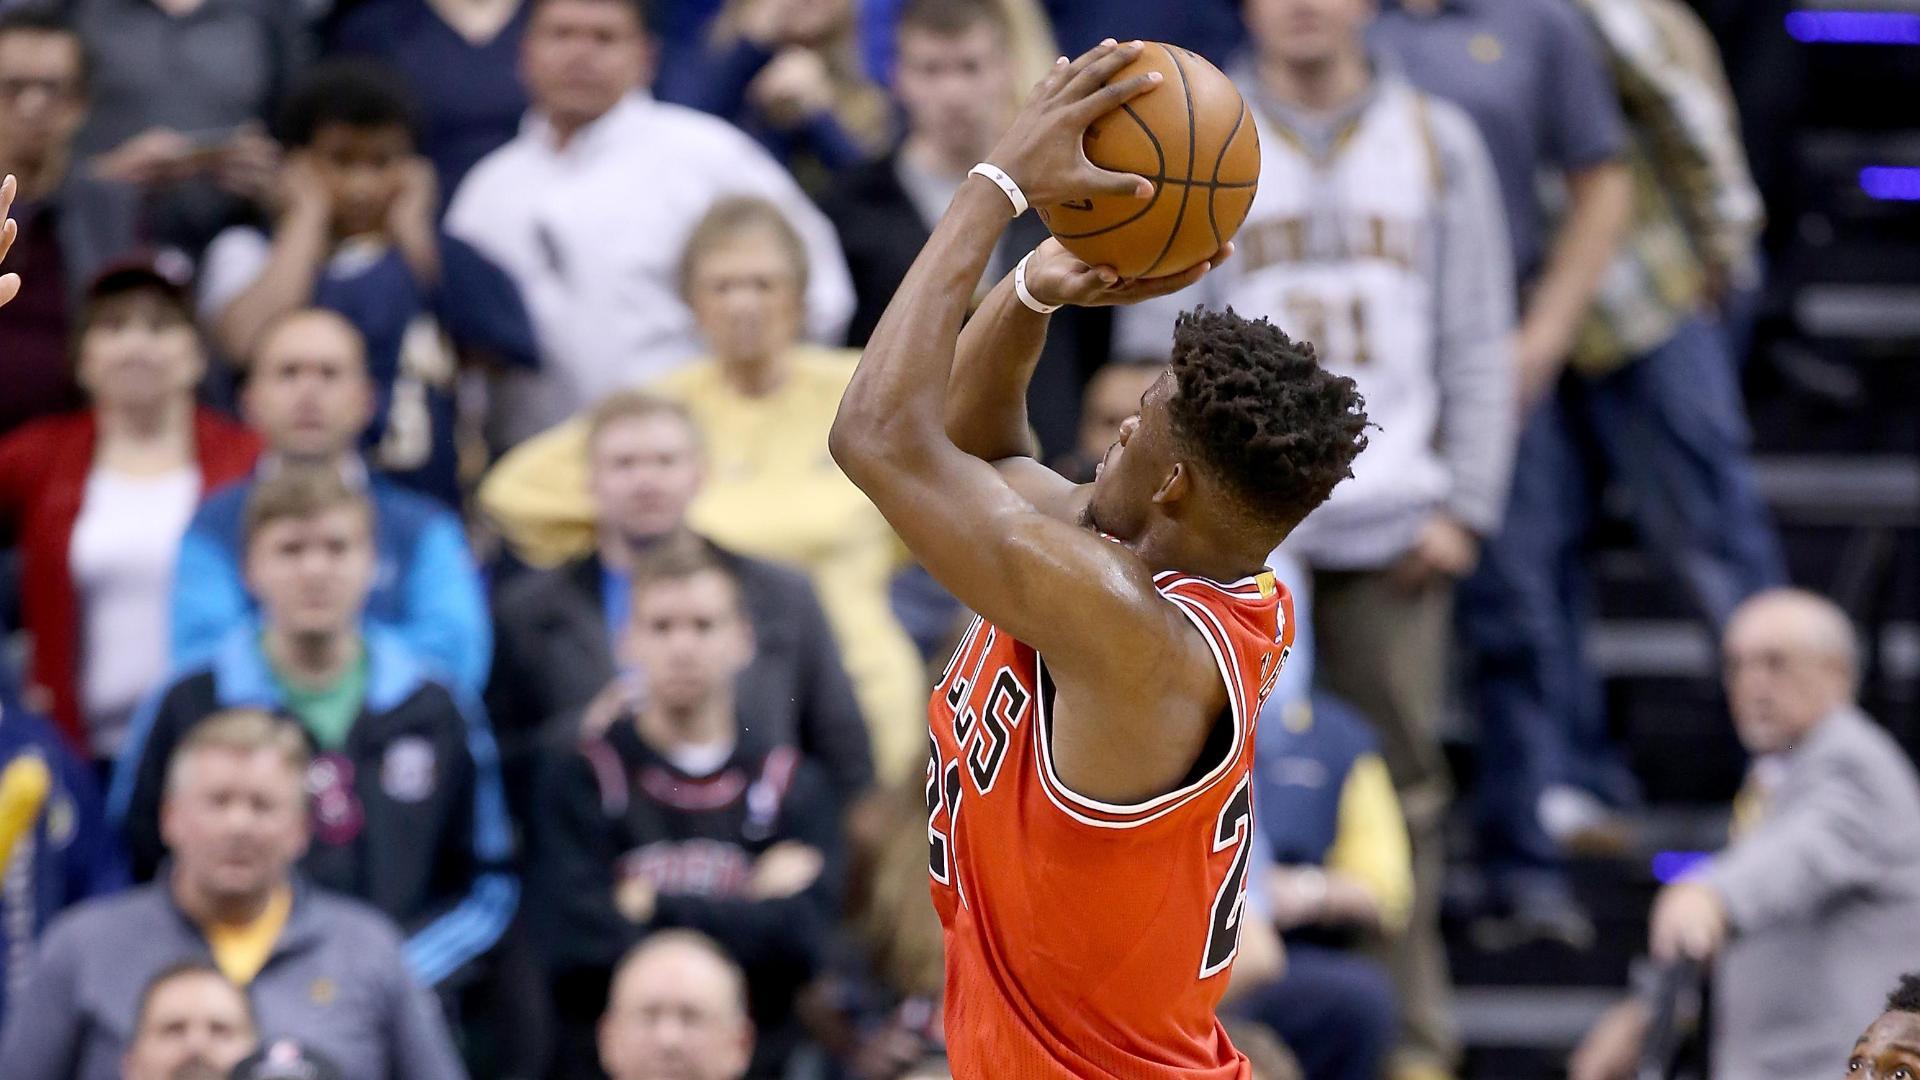 Chicago Bulls vs. Indiana Pacers - Recap - March 29, 2016 - ESPN